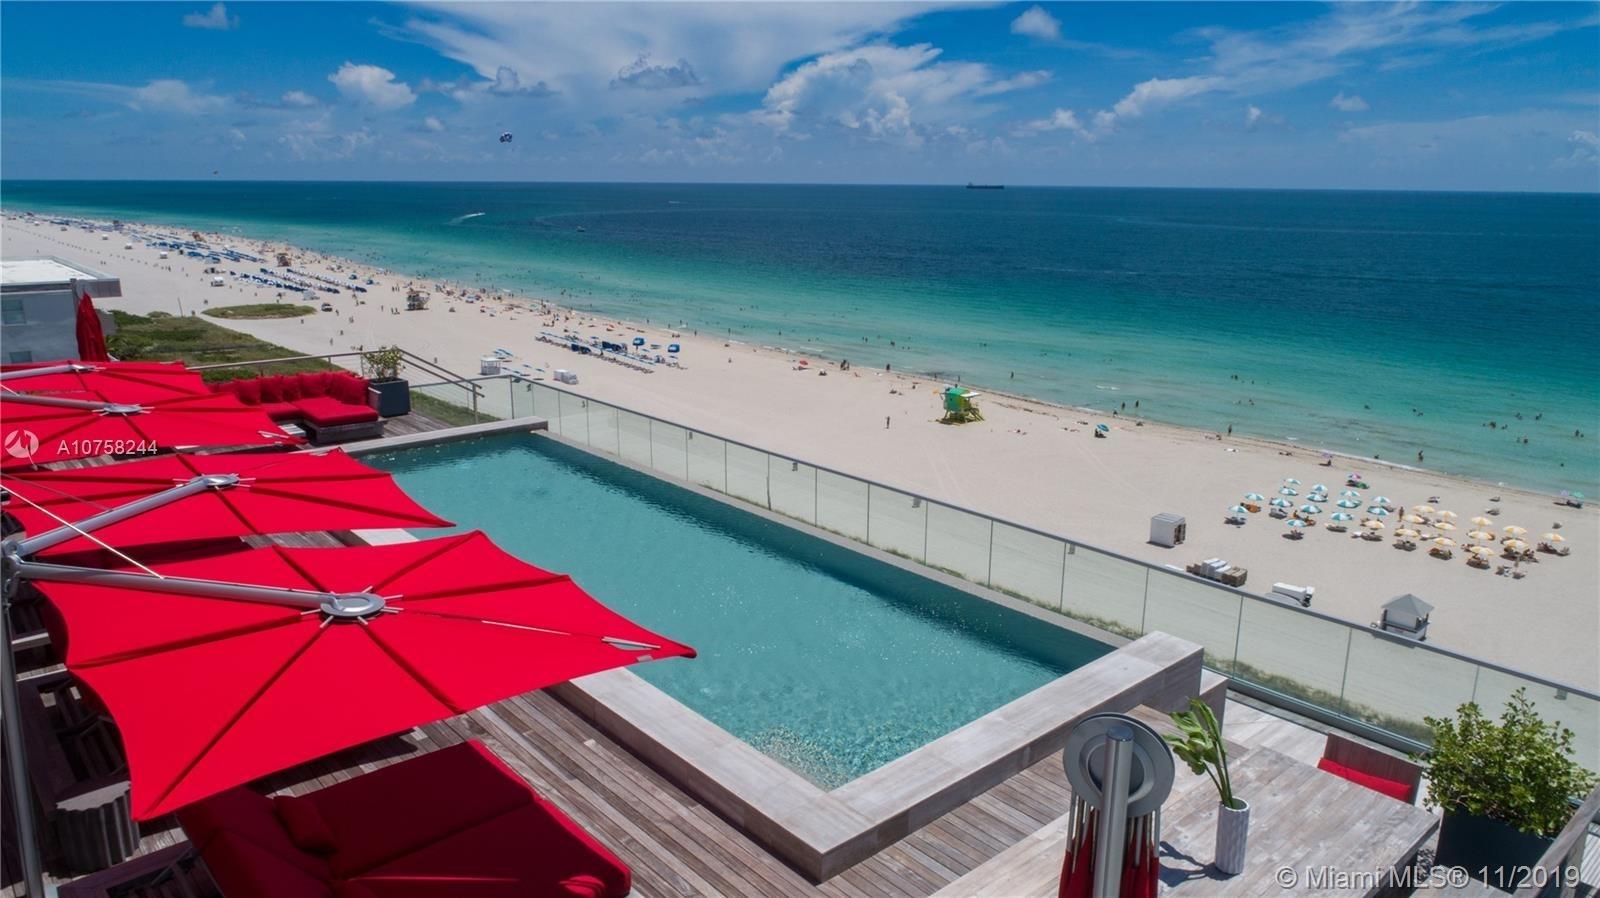 321 Ocean Drive Unit #Ph Condo For Sale In South Beach in Map Ocean Drive Miami